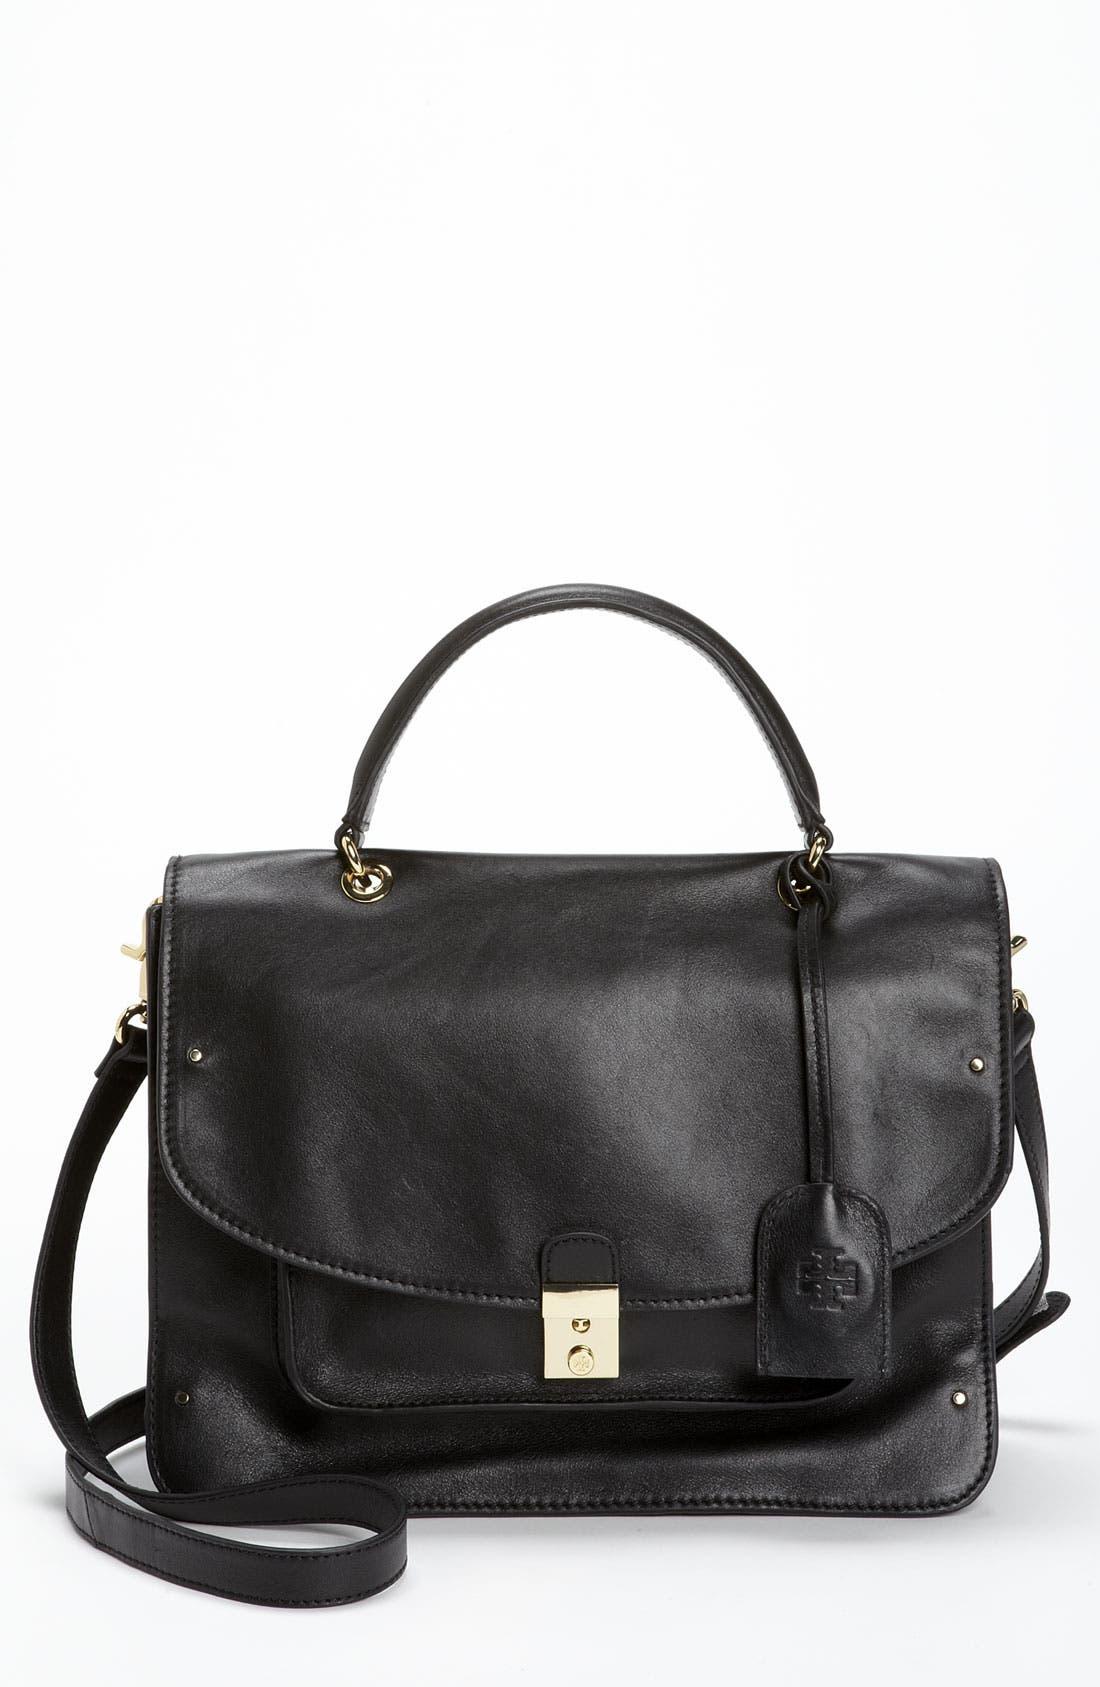 Alternate Image 1 Selected - Tory Burch 'Priscilla' Crossbody Bag